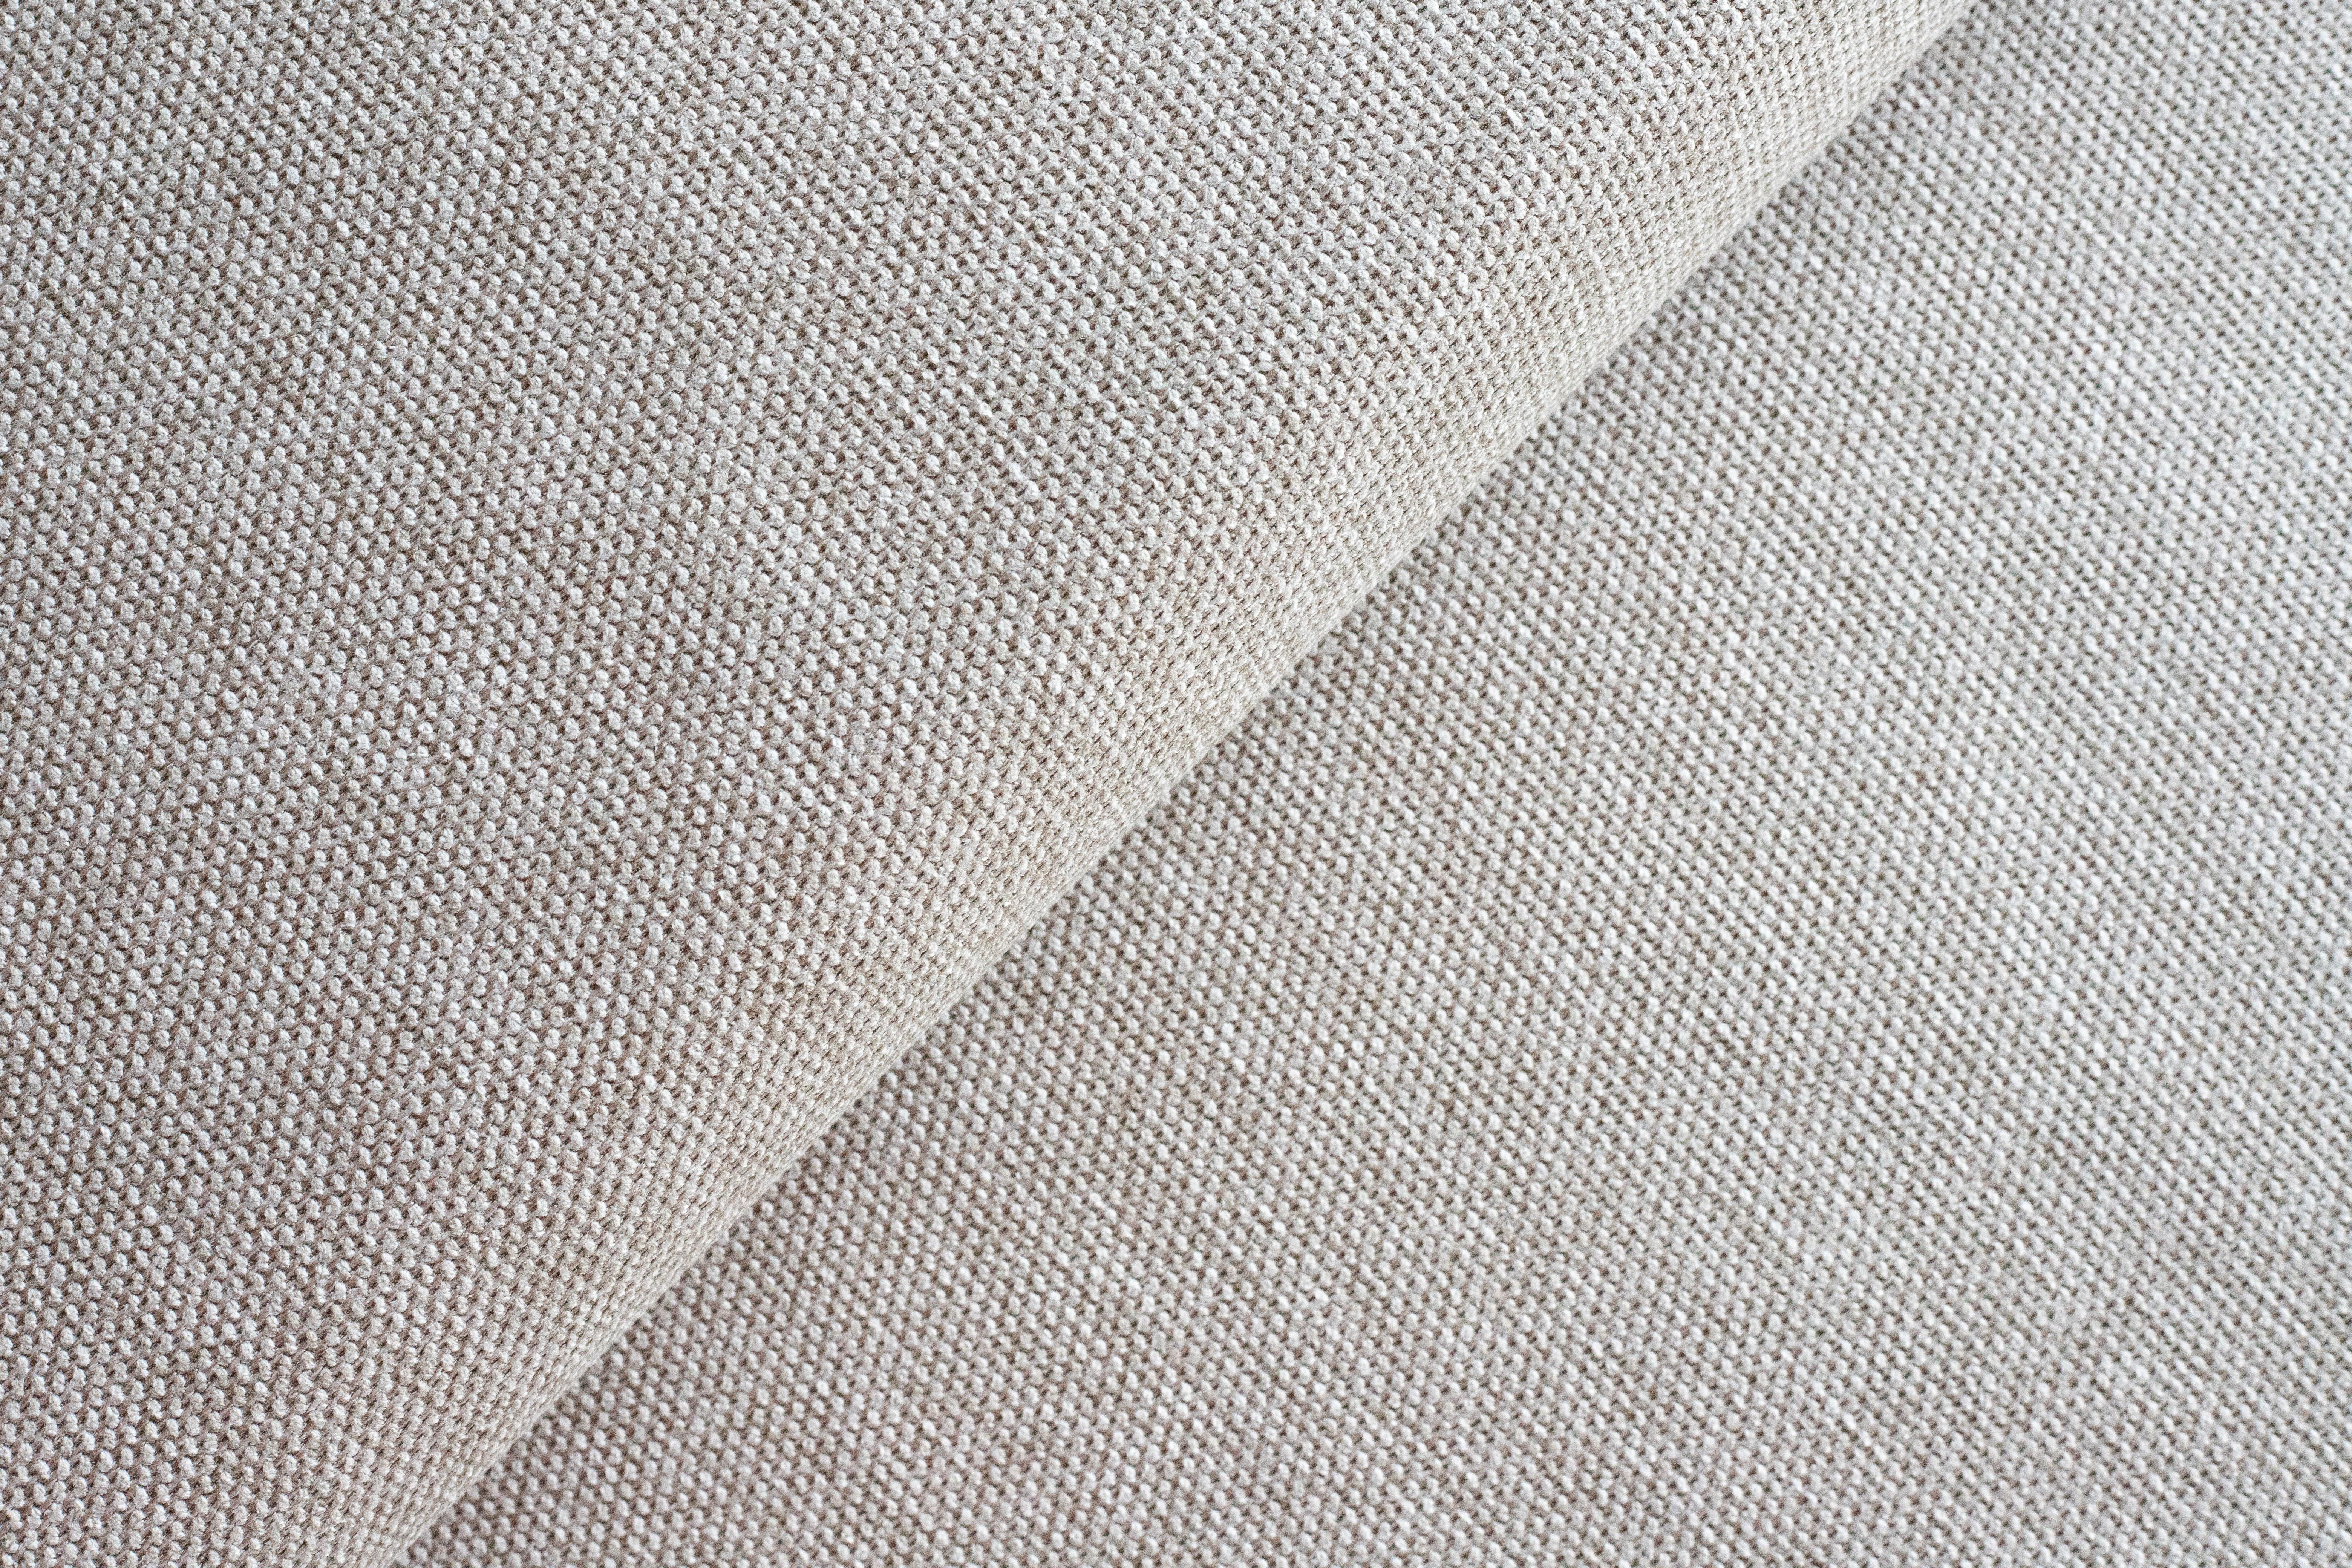 Potocki tkaniny: urban 1 300dpi